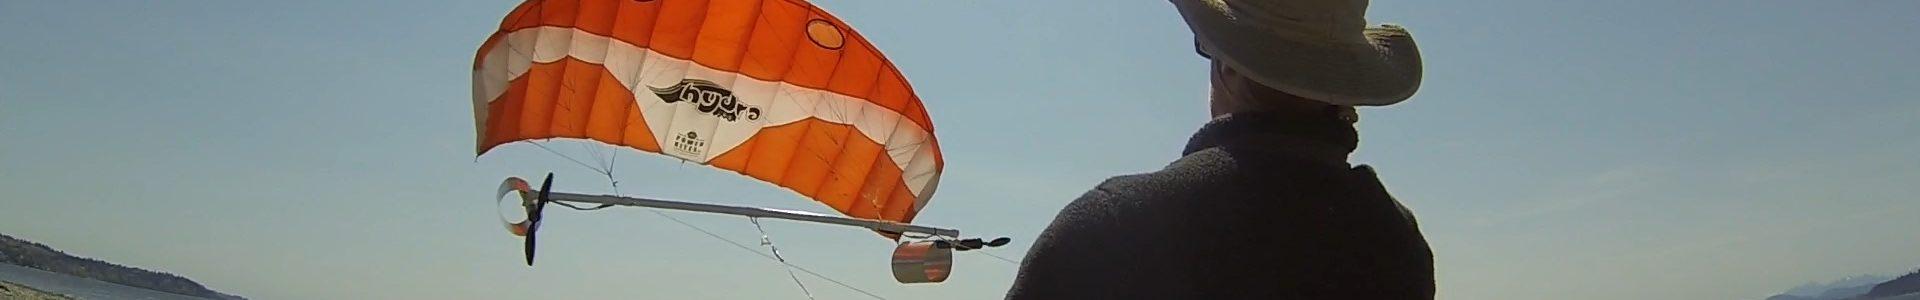 Wind Turbine Testing using 3m Kite